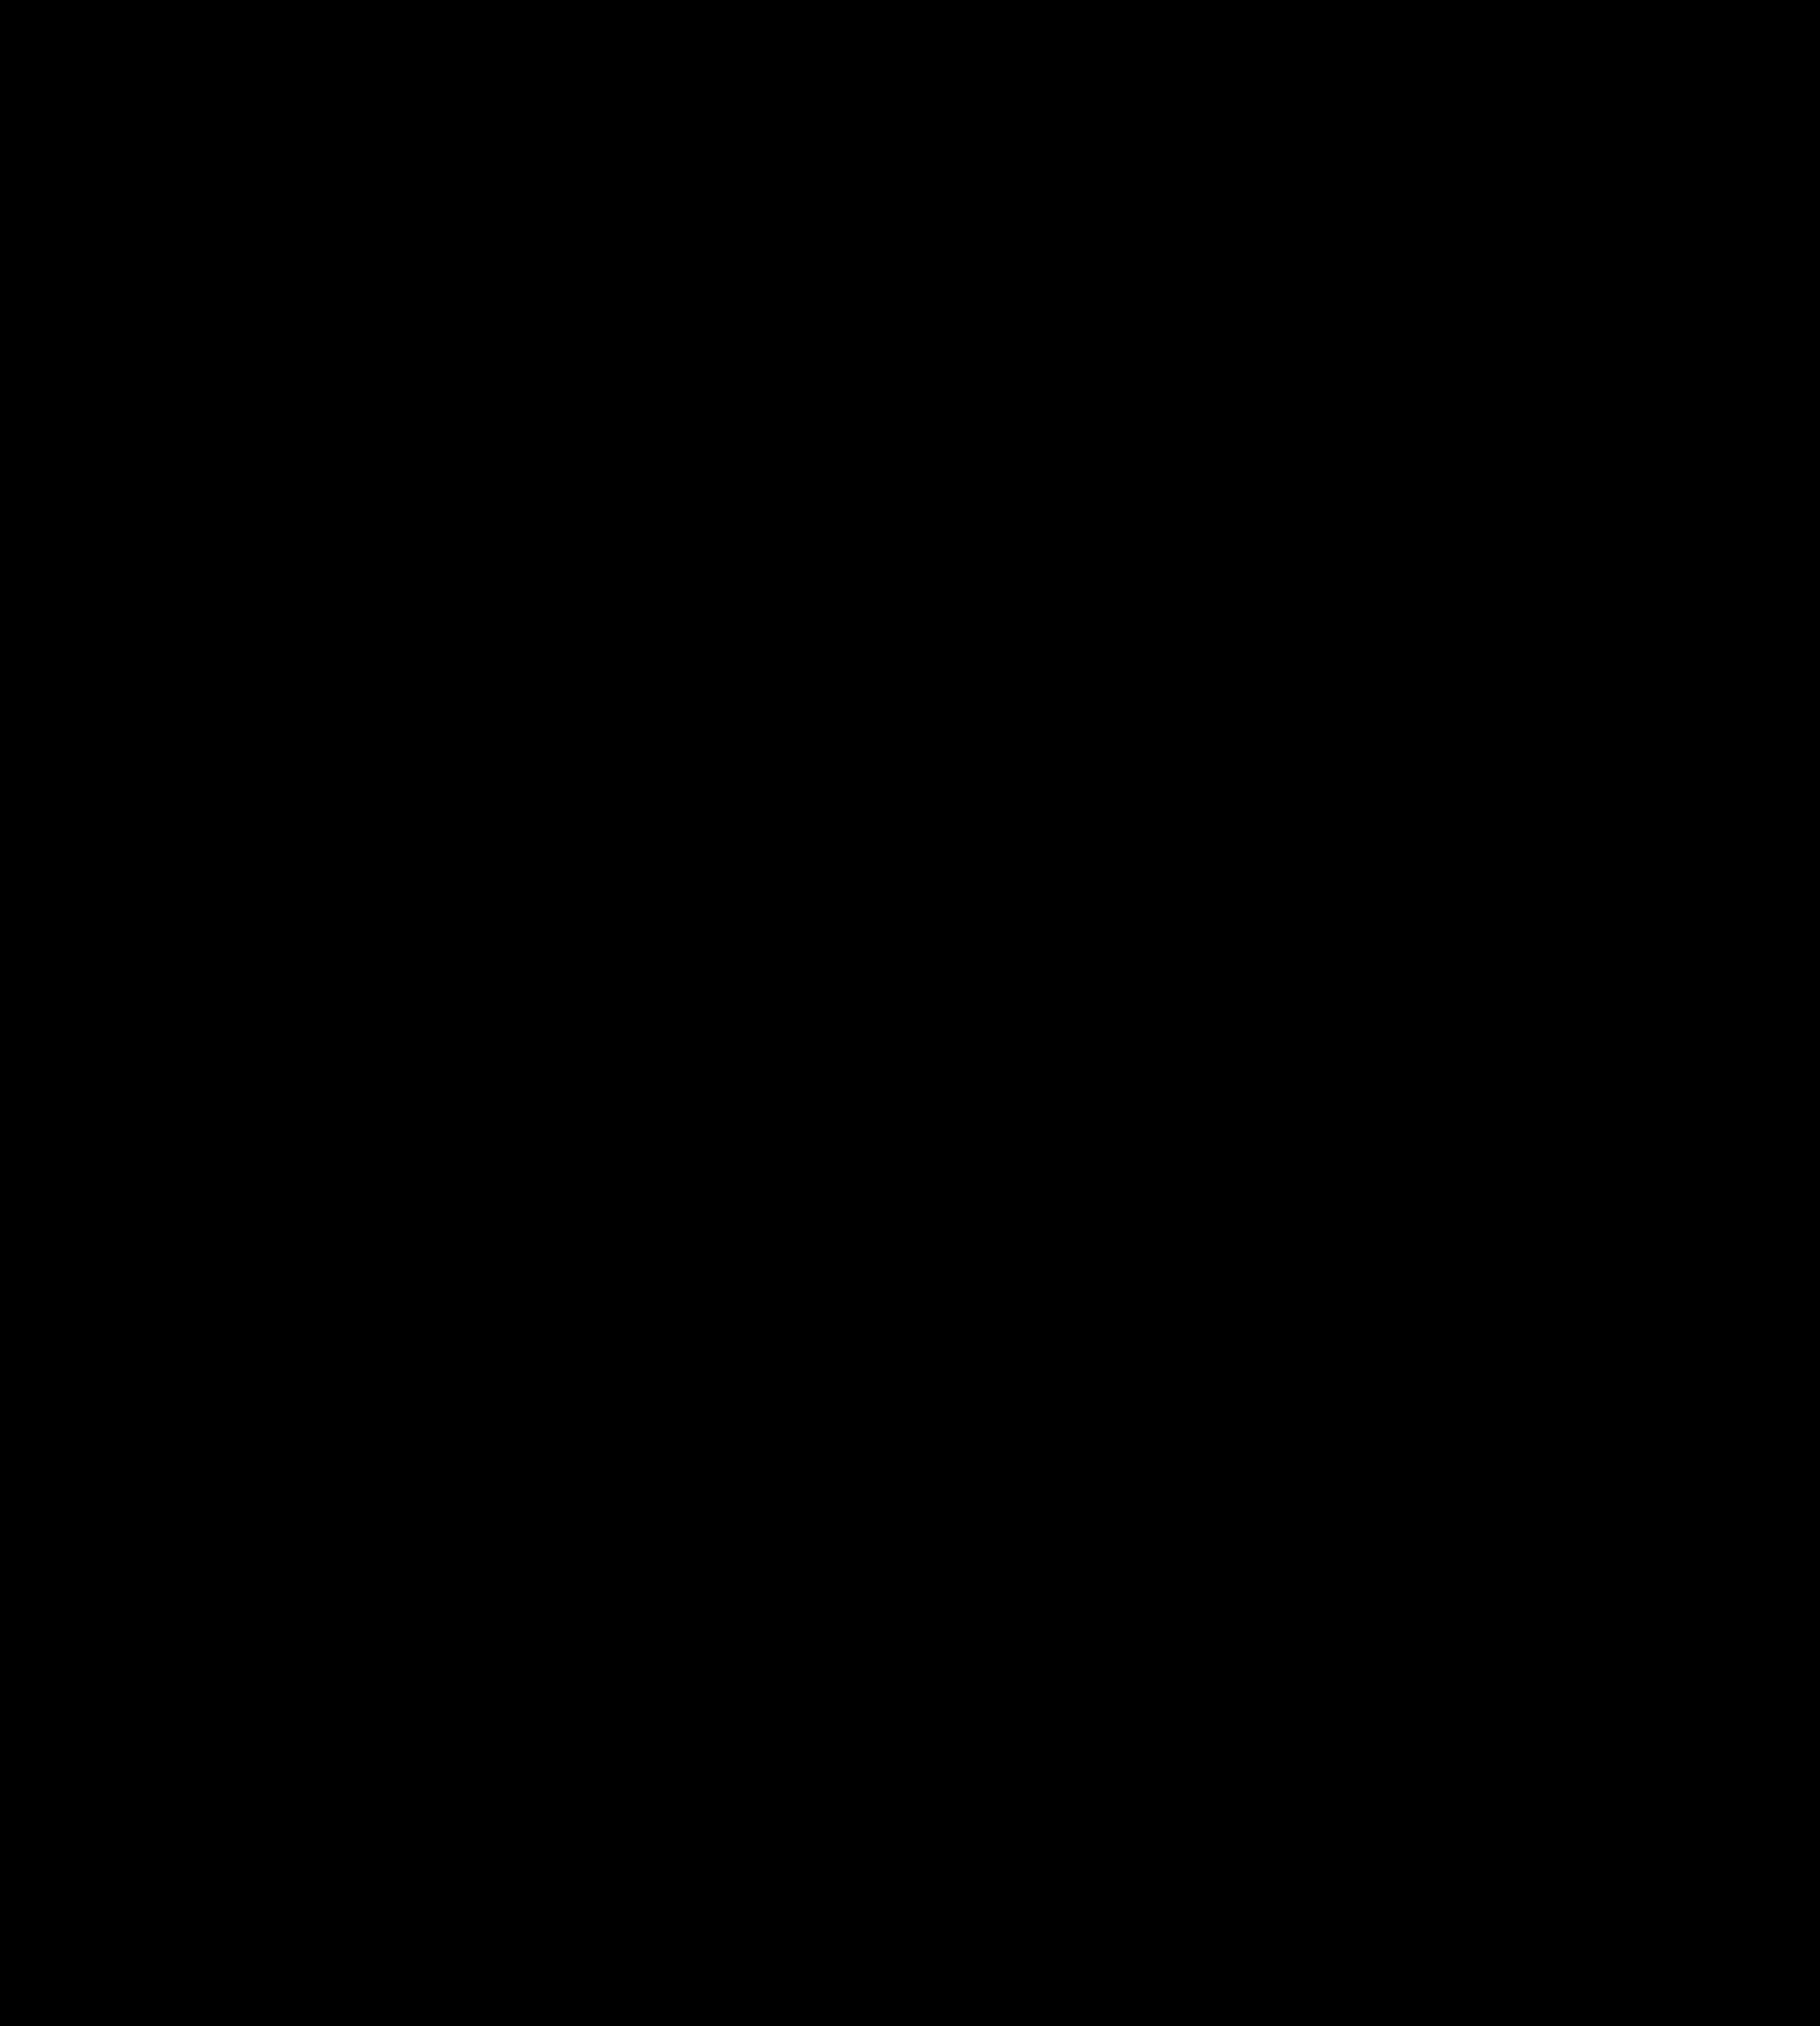 peiec_v3-1